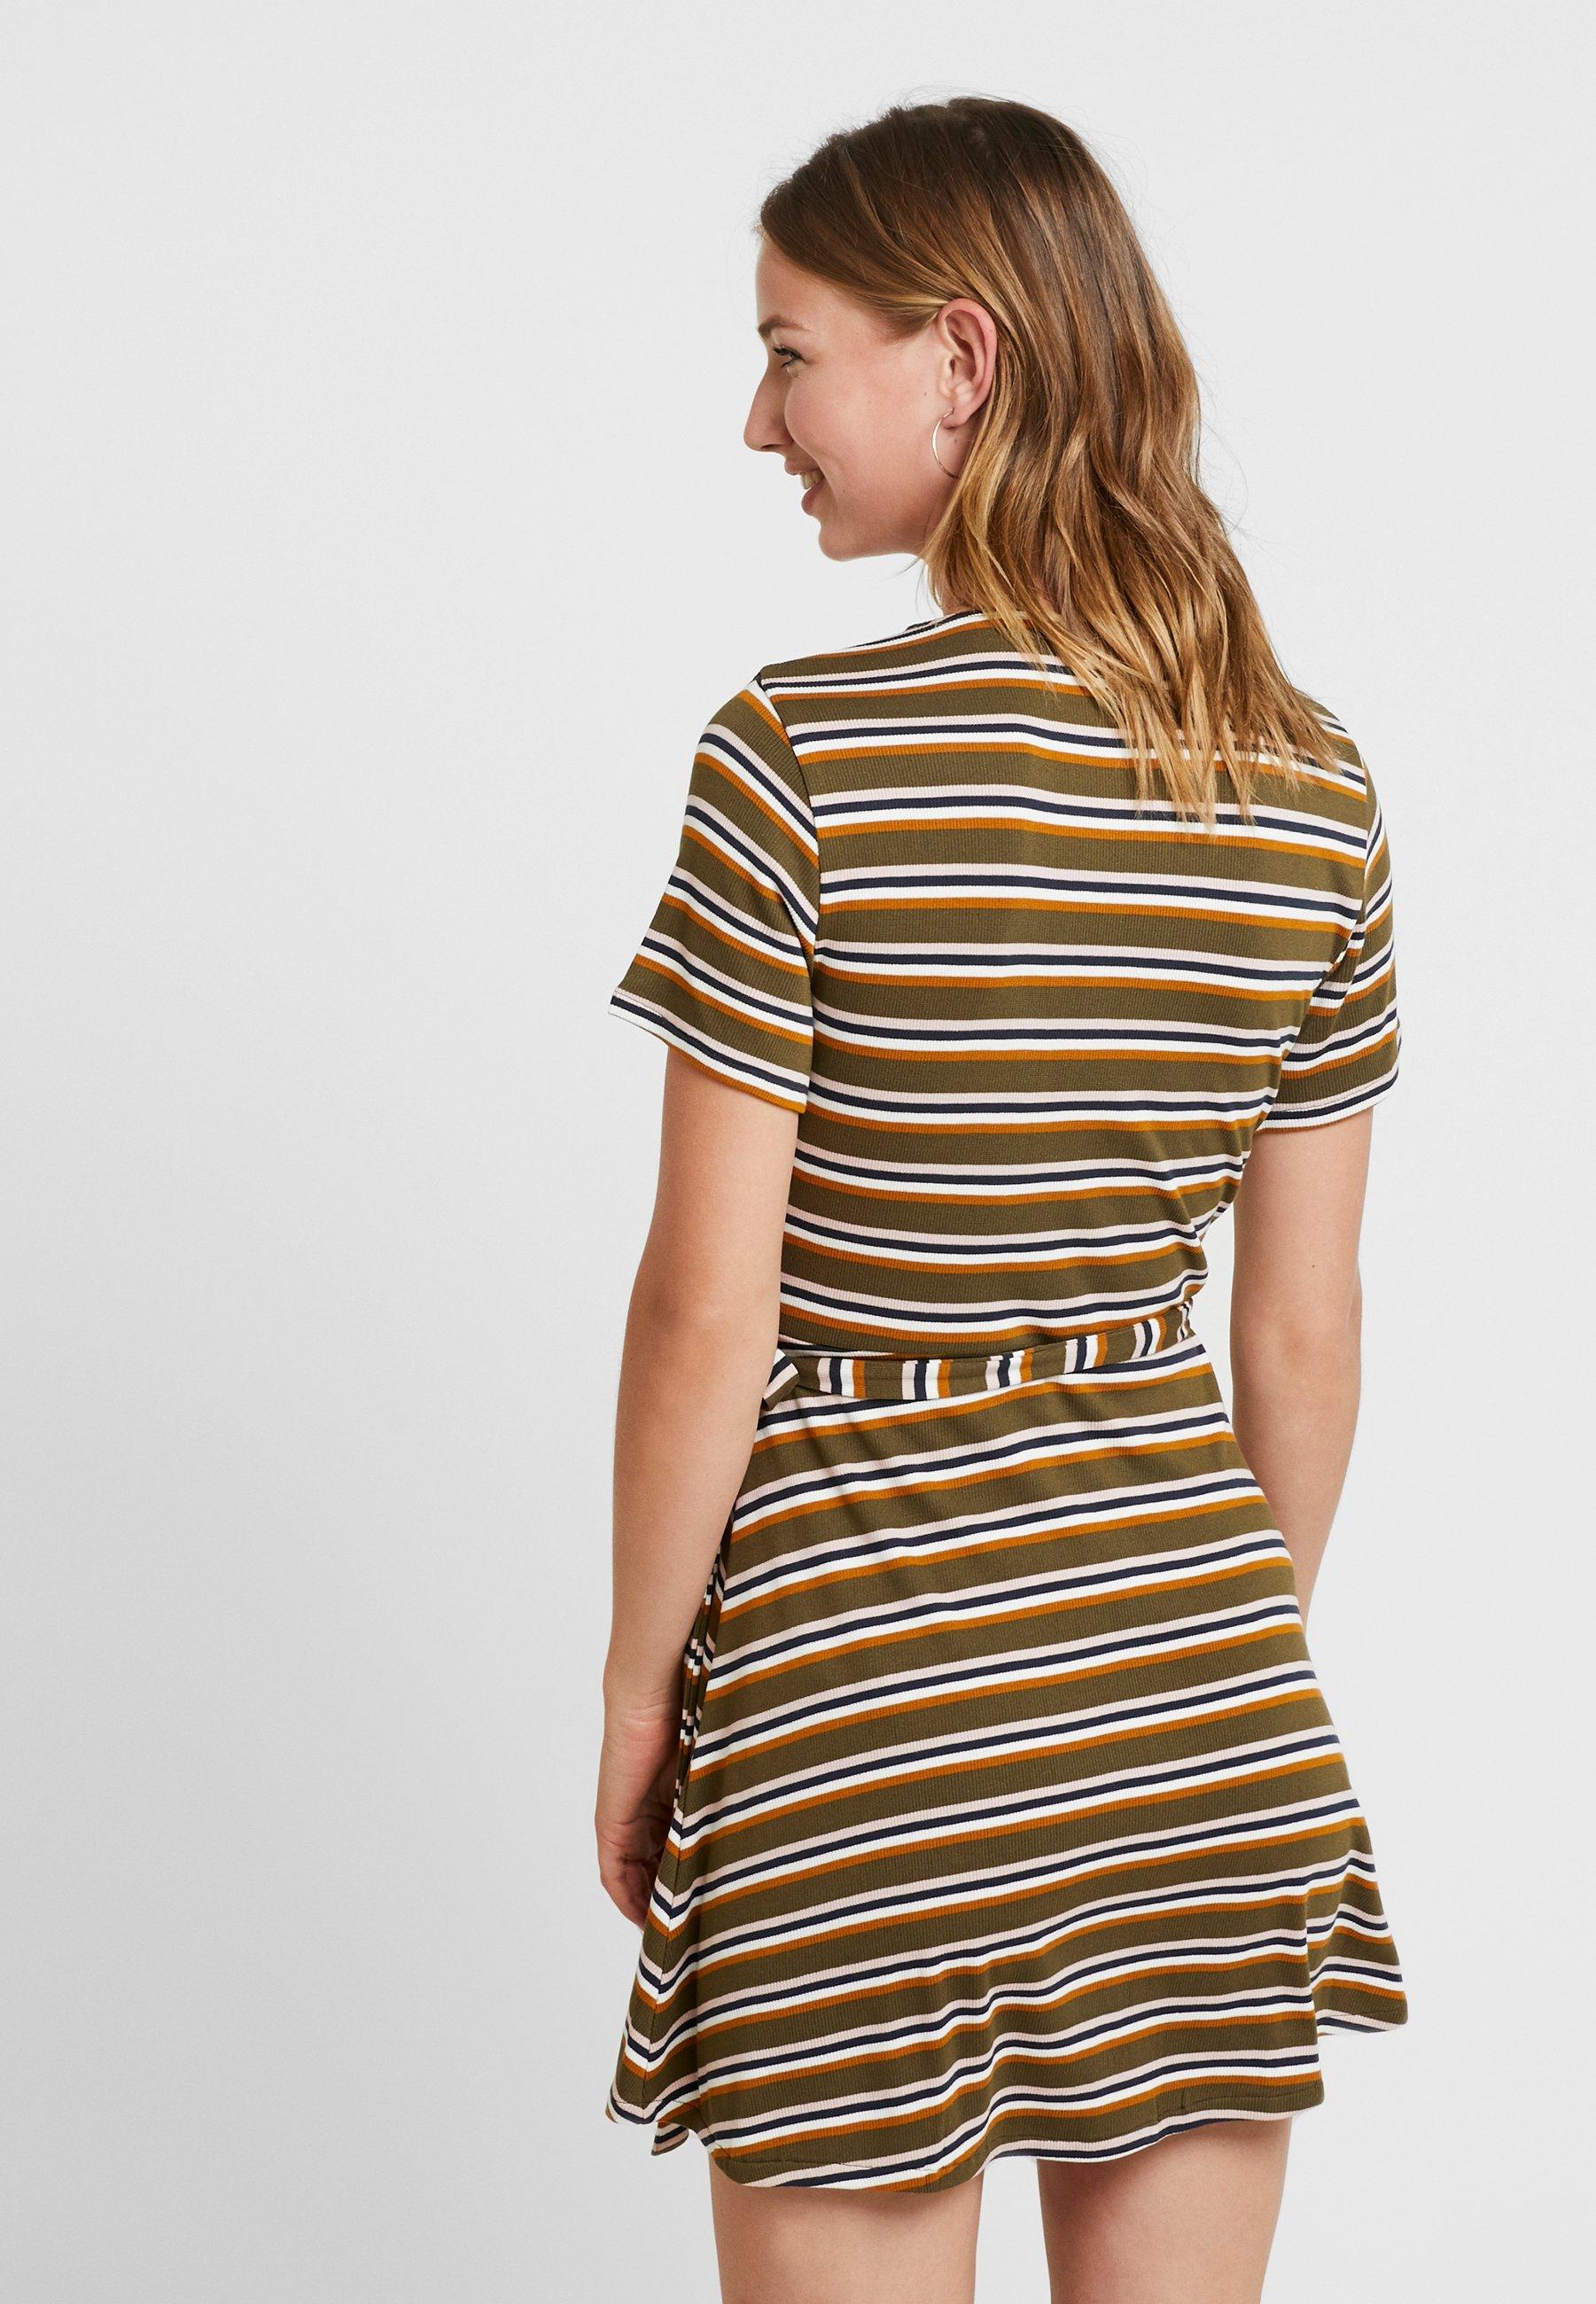 slater dress - strickkleid - army drab